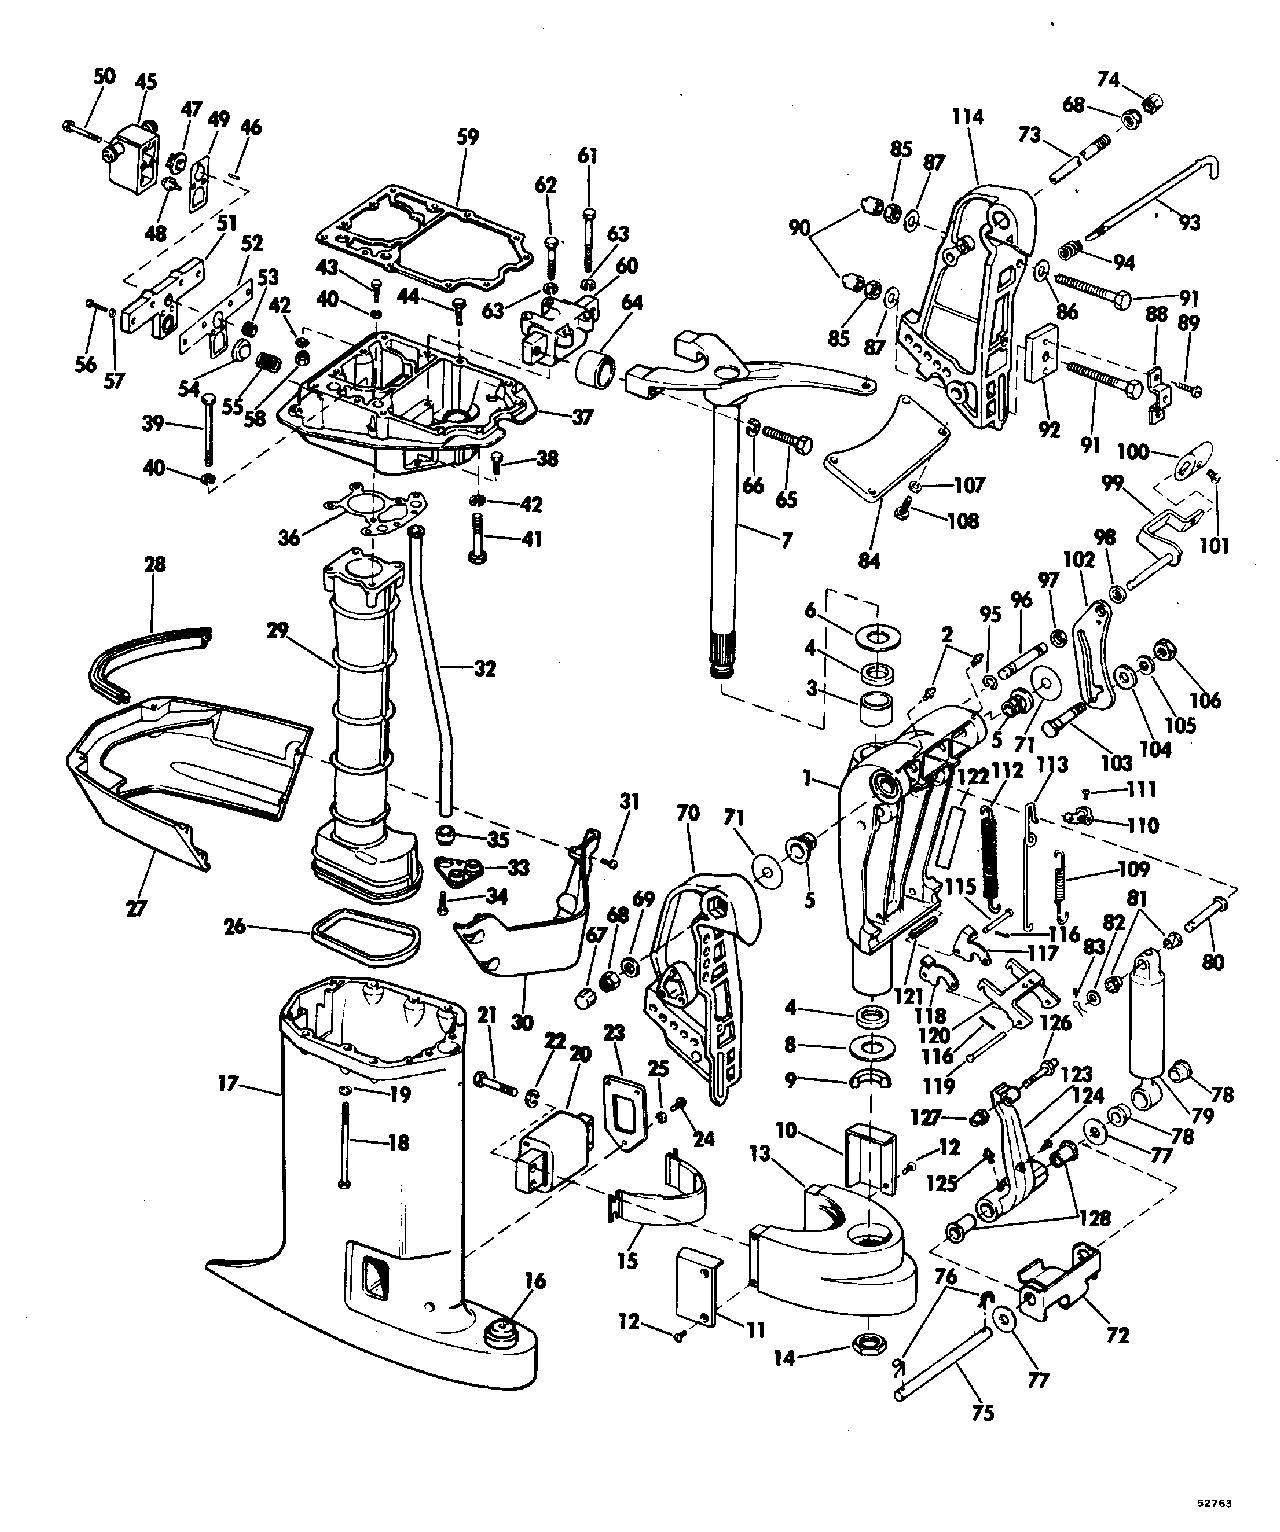 1973 Evinrude 6 5 Hp Wiring Diagram Full Hd Version Wiring Diagram Levy Diagram Kuteportal Fr